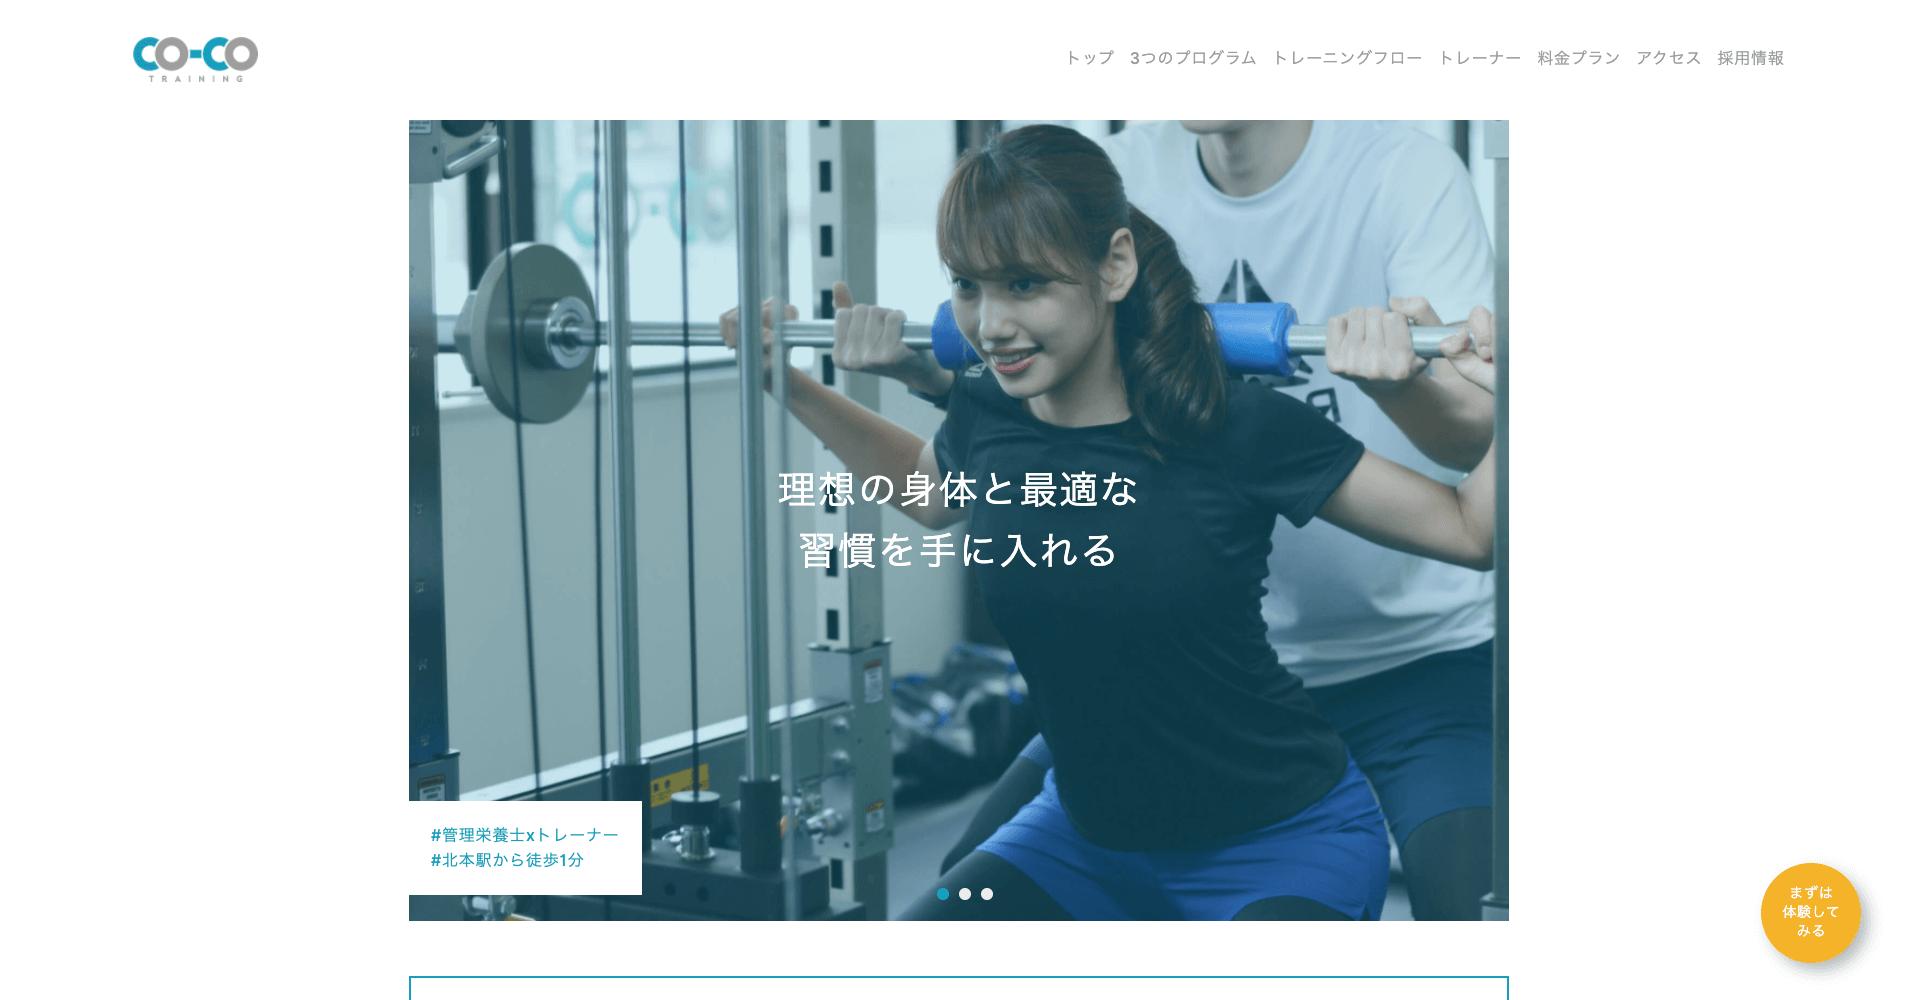 CO-CO training